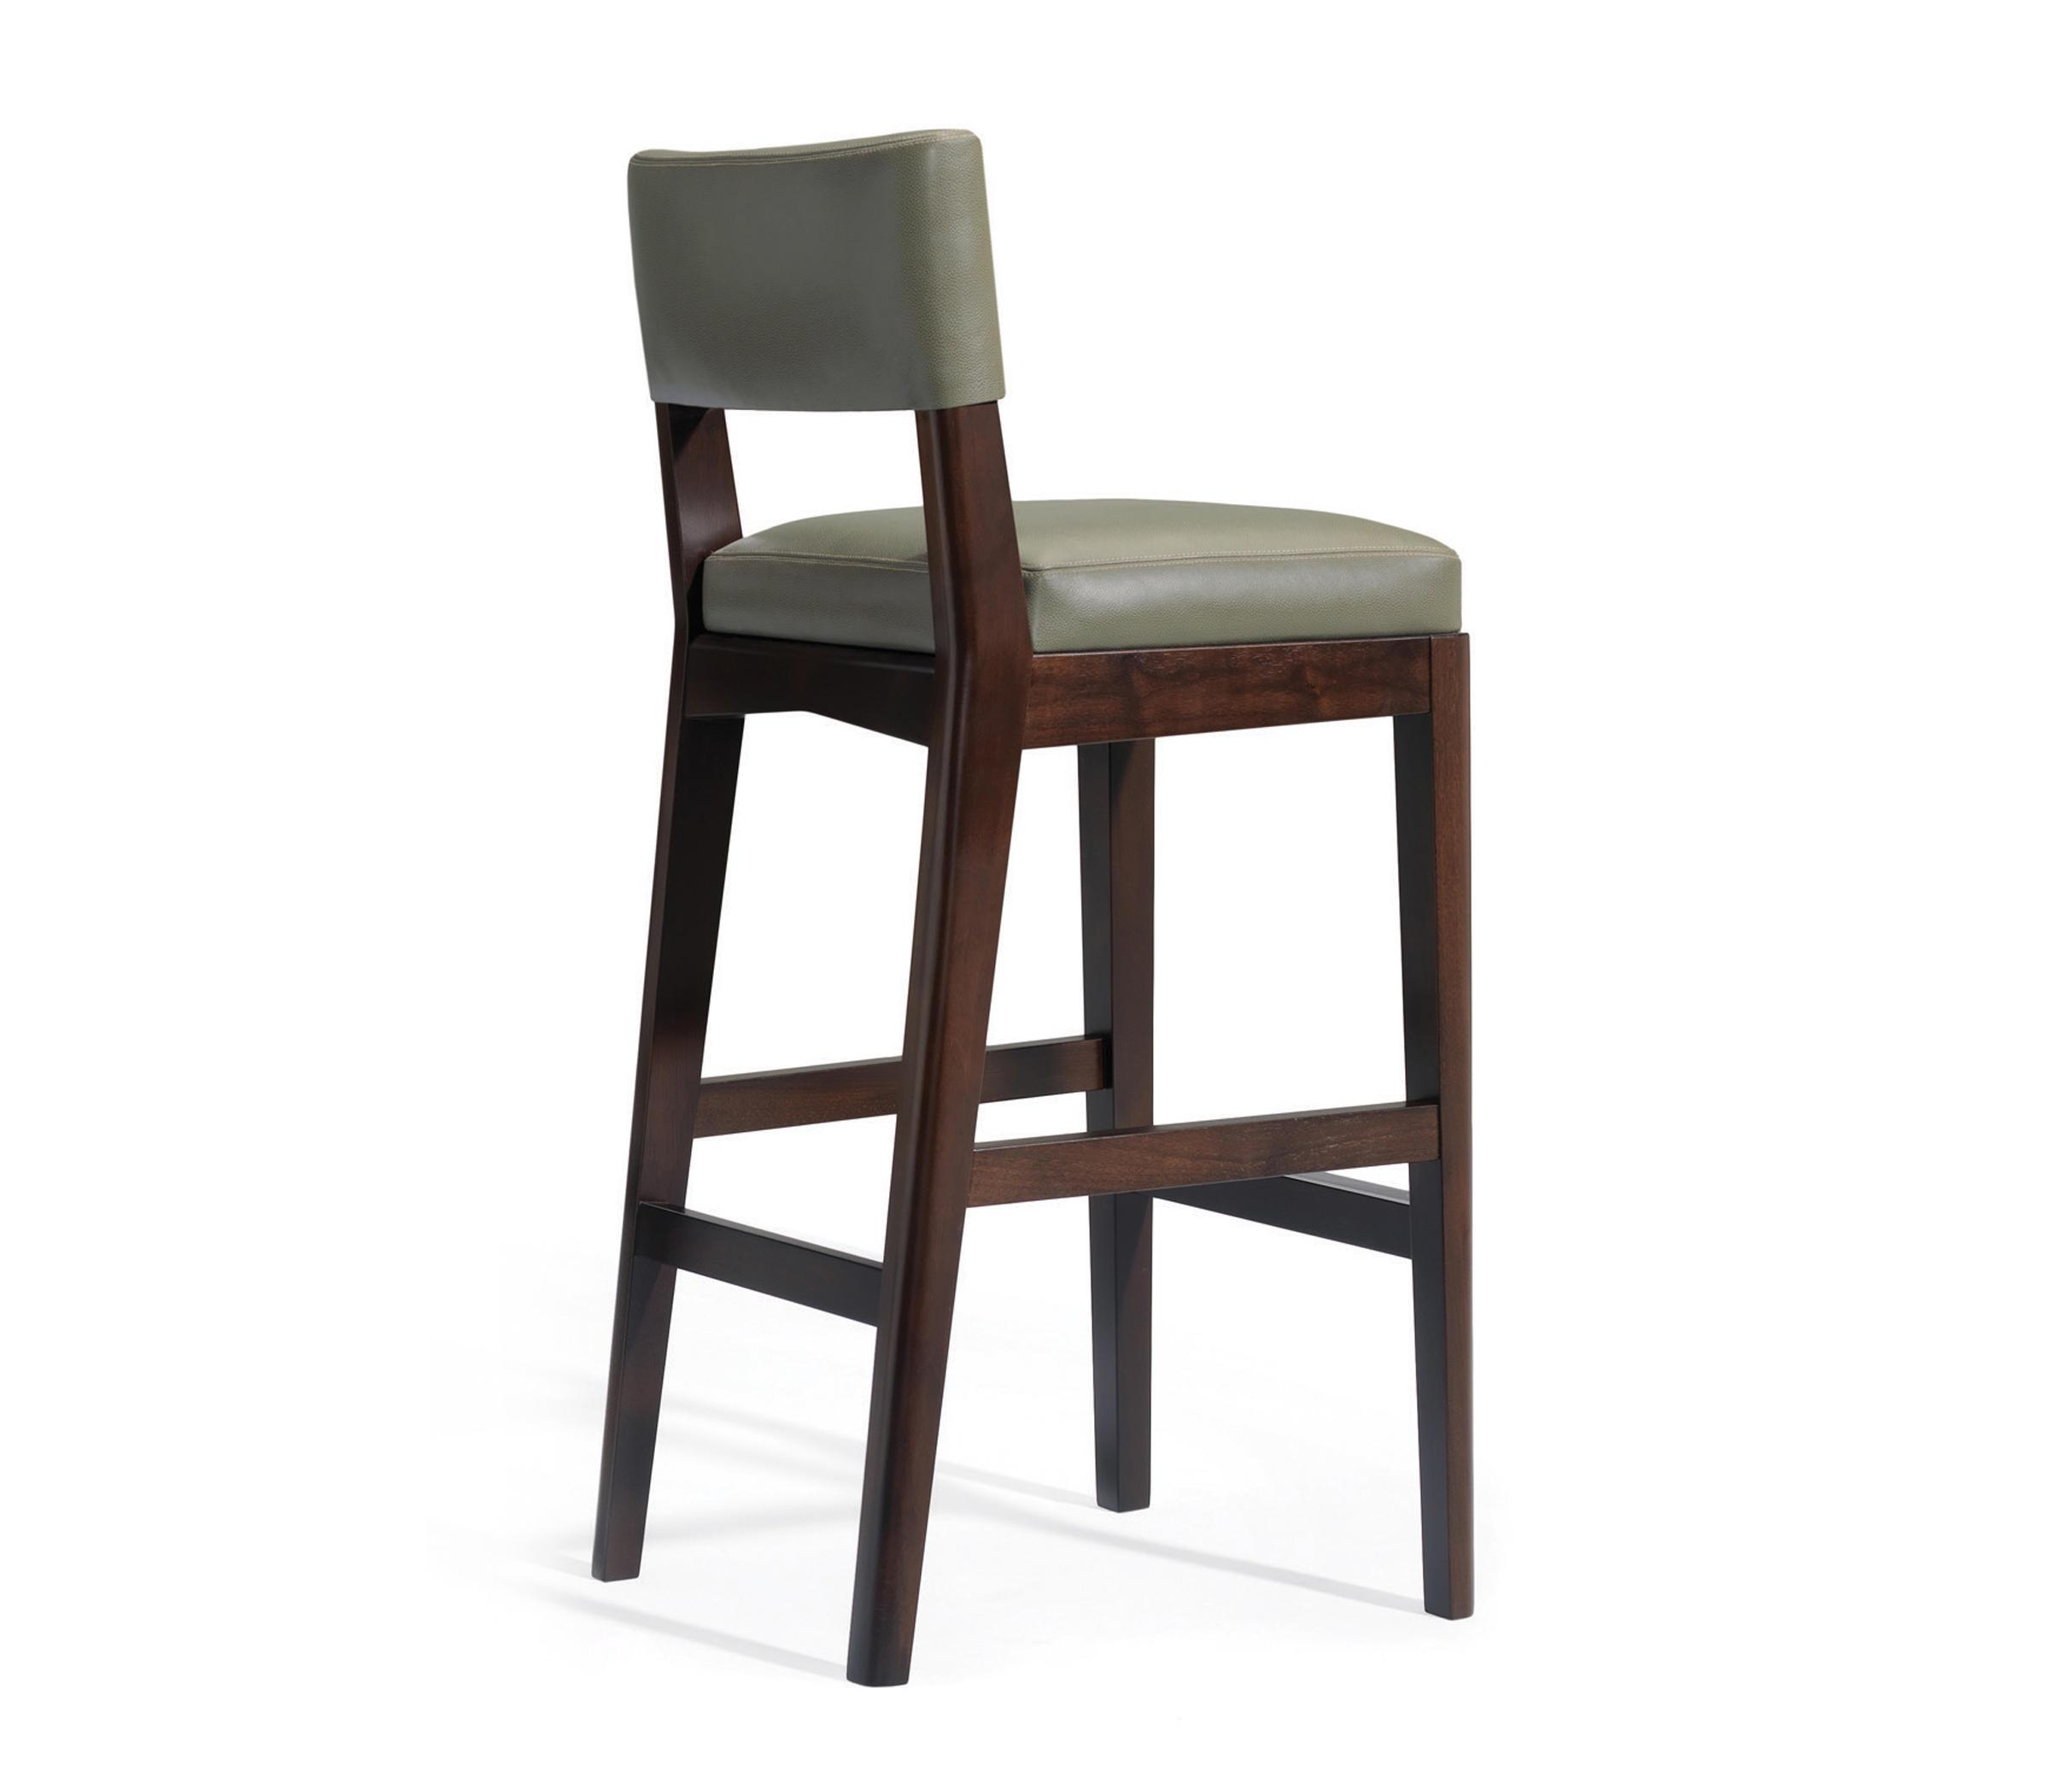 Cadet bar stools barhocker von altura furniture architonic for Barhocker usa